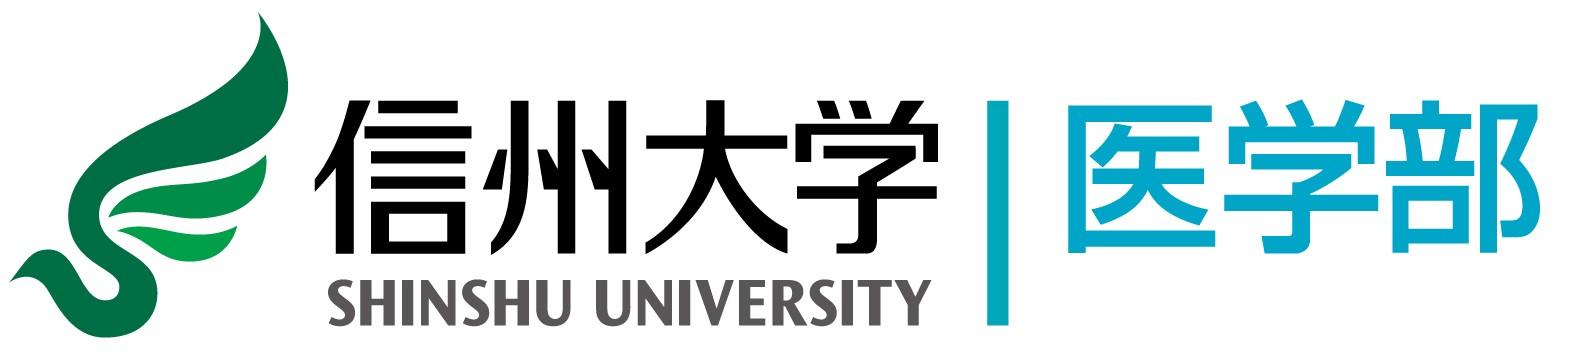 ShinshuUniv_logo.jpg